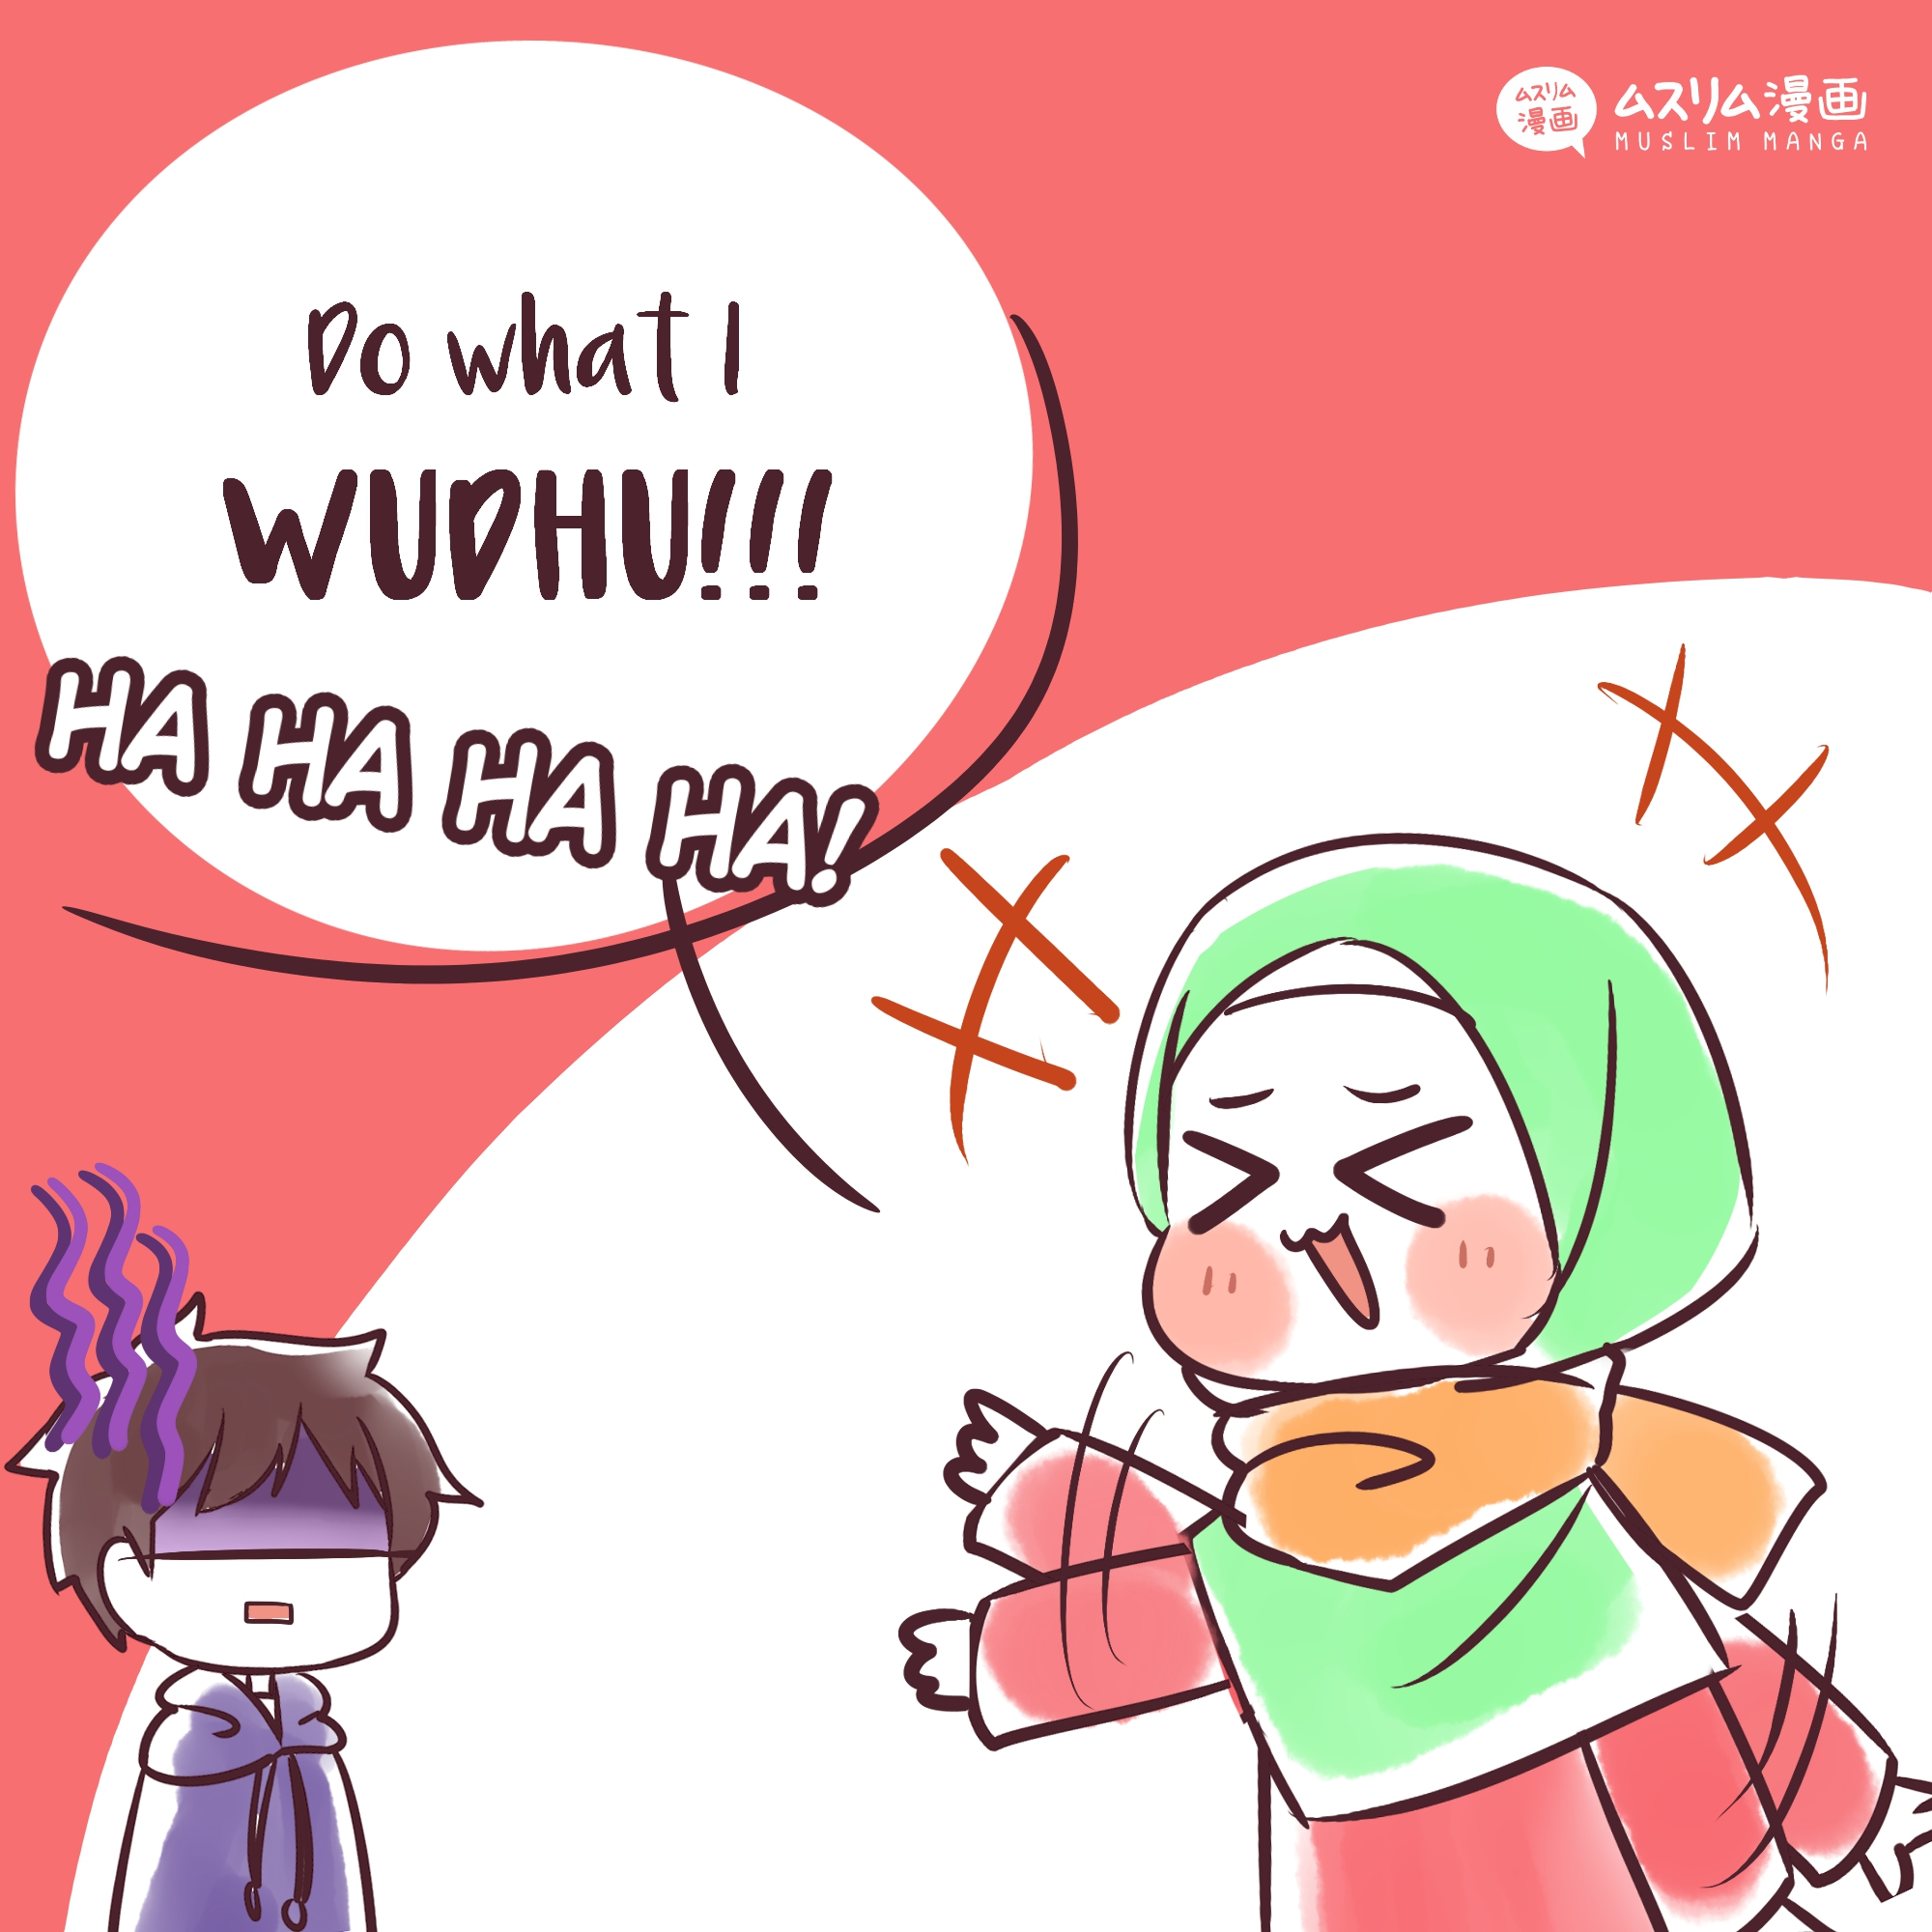 fun puns wudhu 2